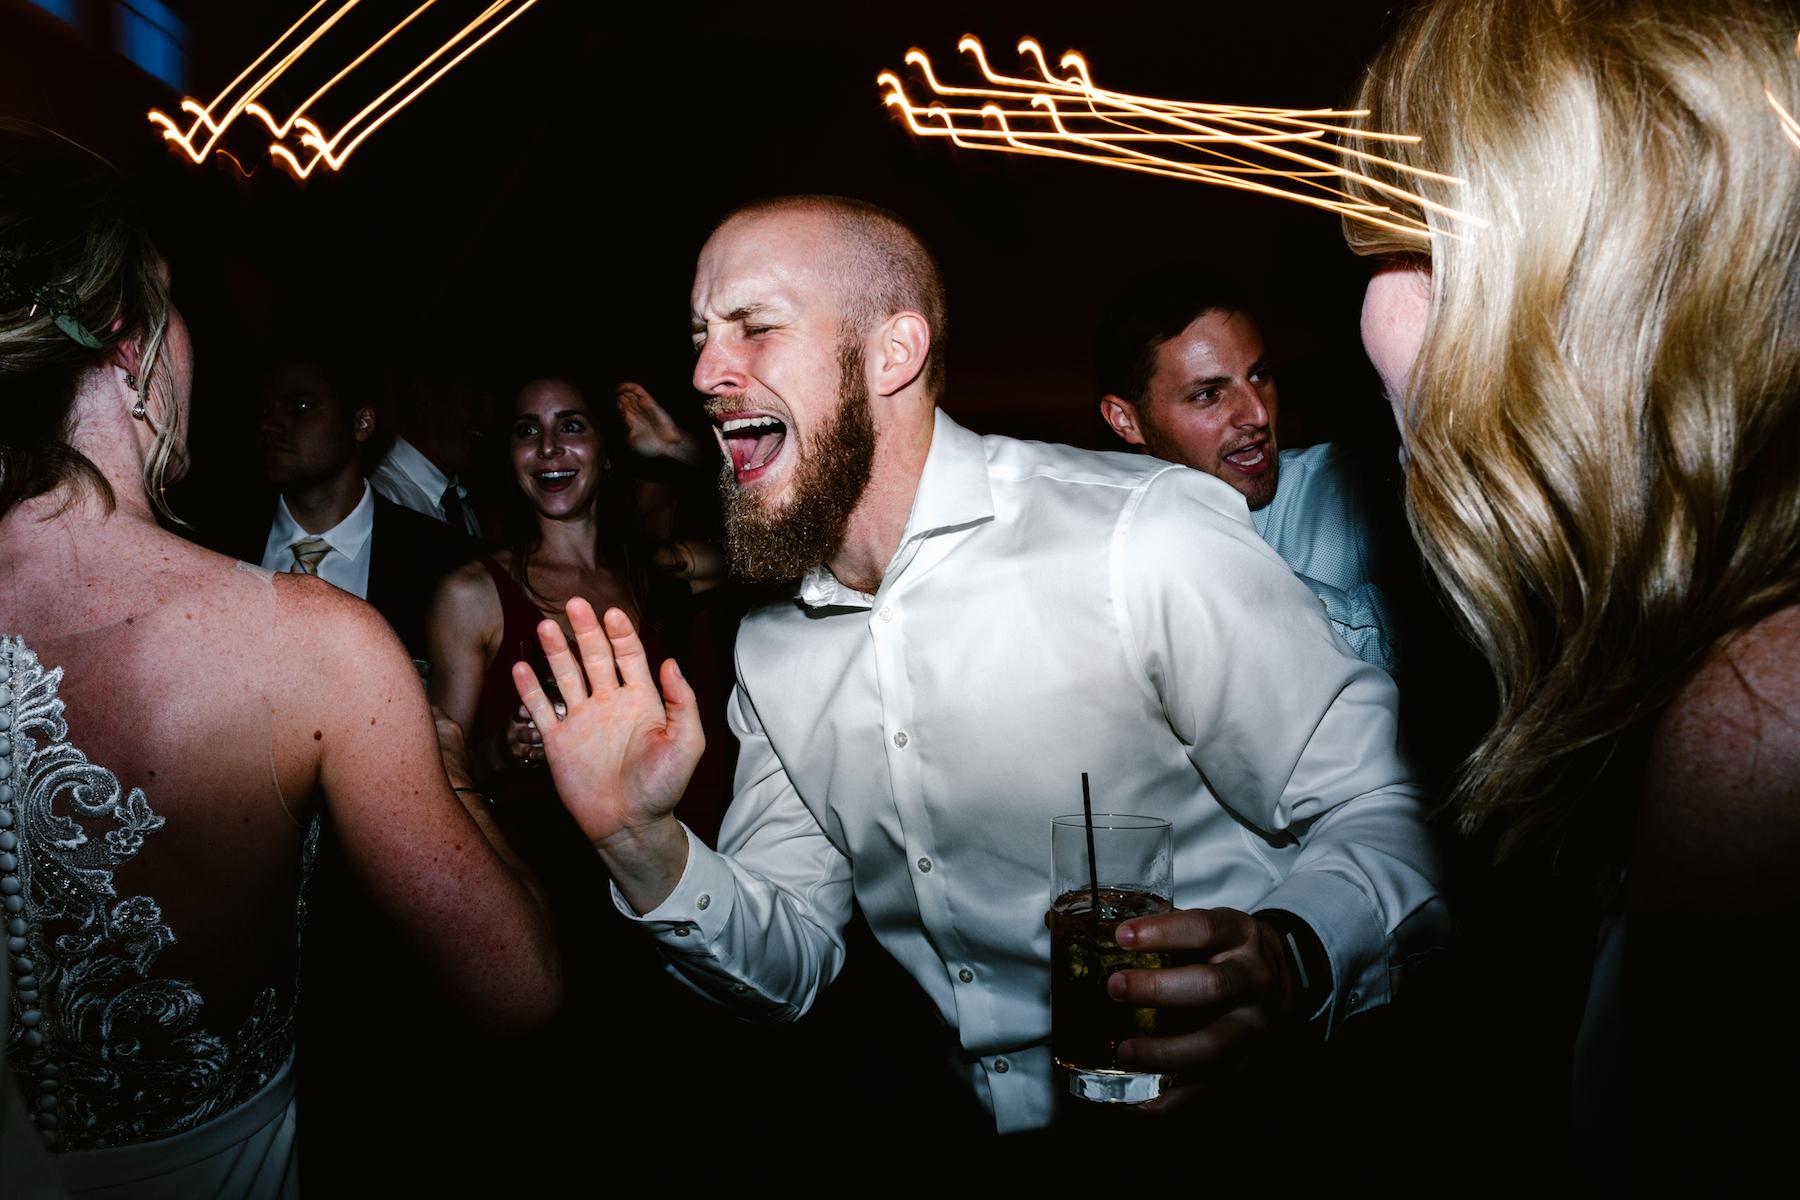 wedding-engagement-photographer-spartanburg-greenville-columbia-carolina-south-north-546.JPG